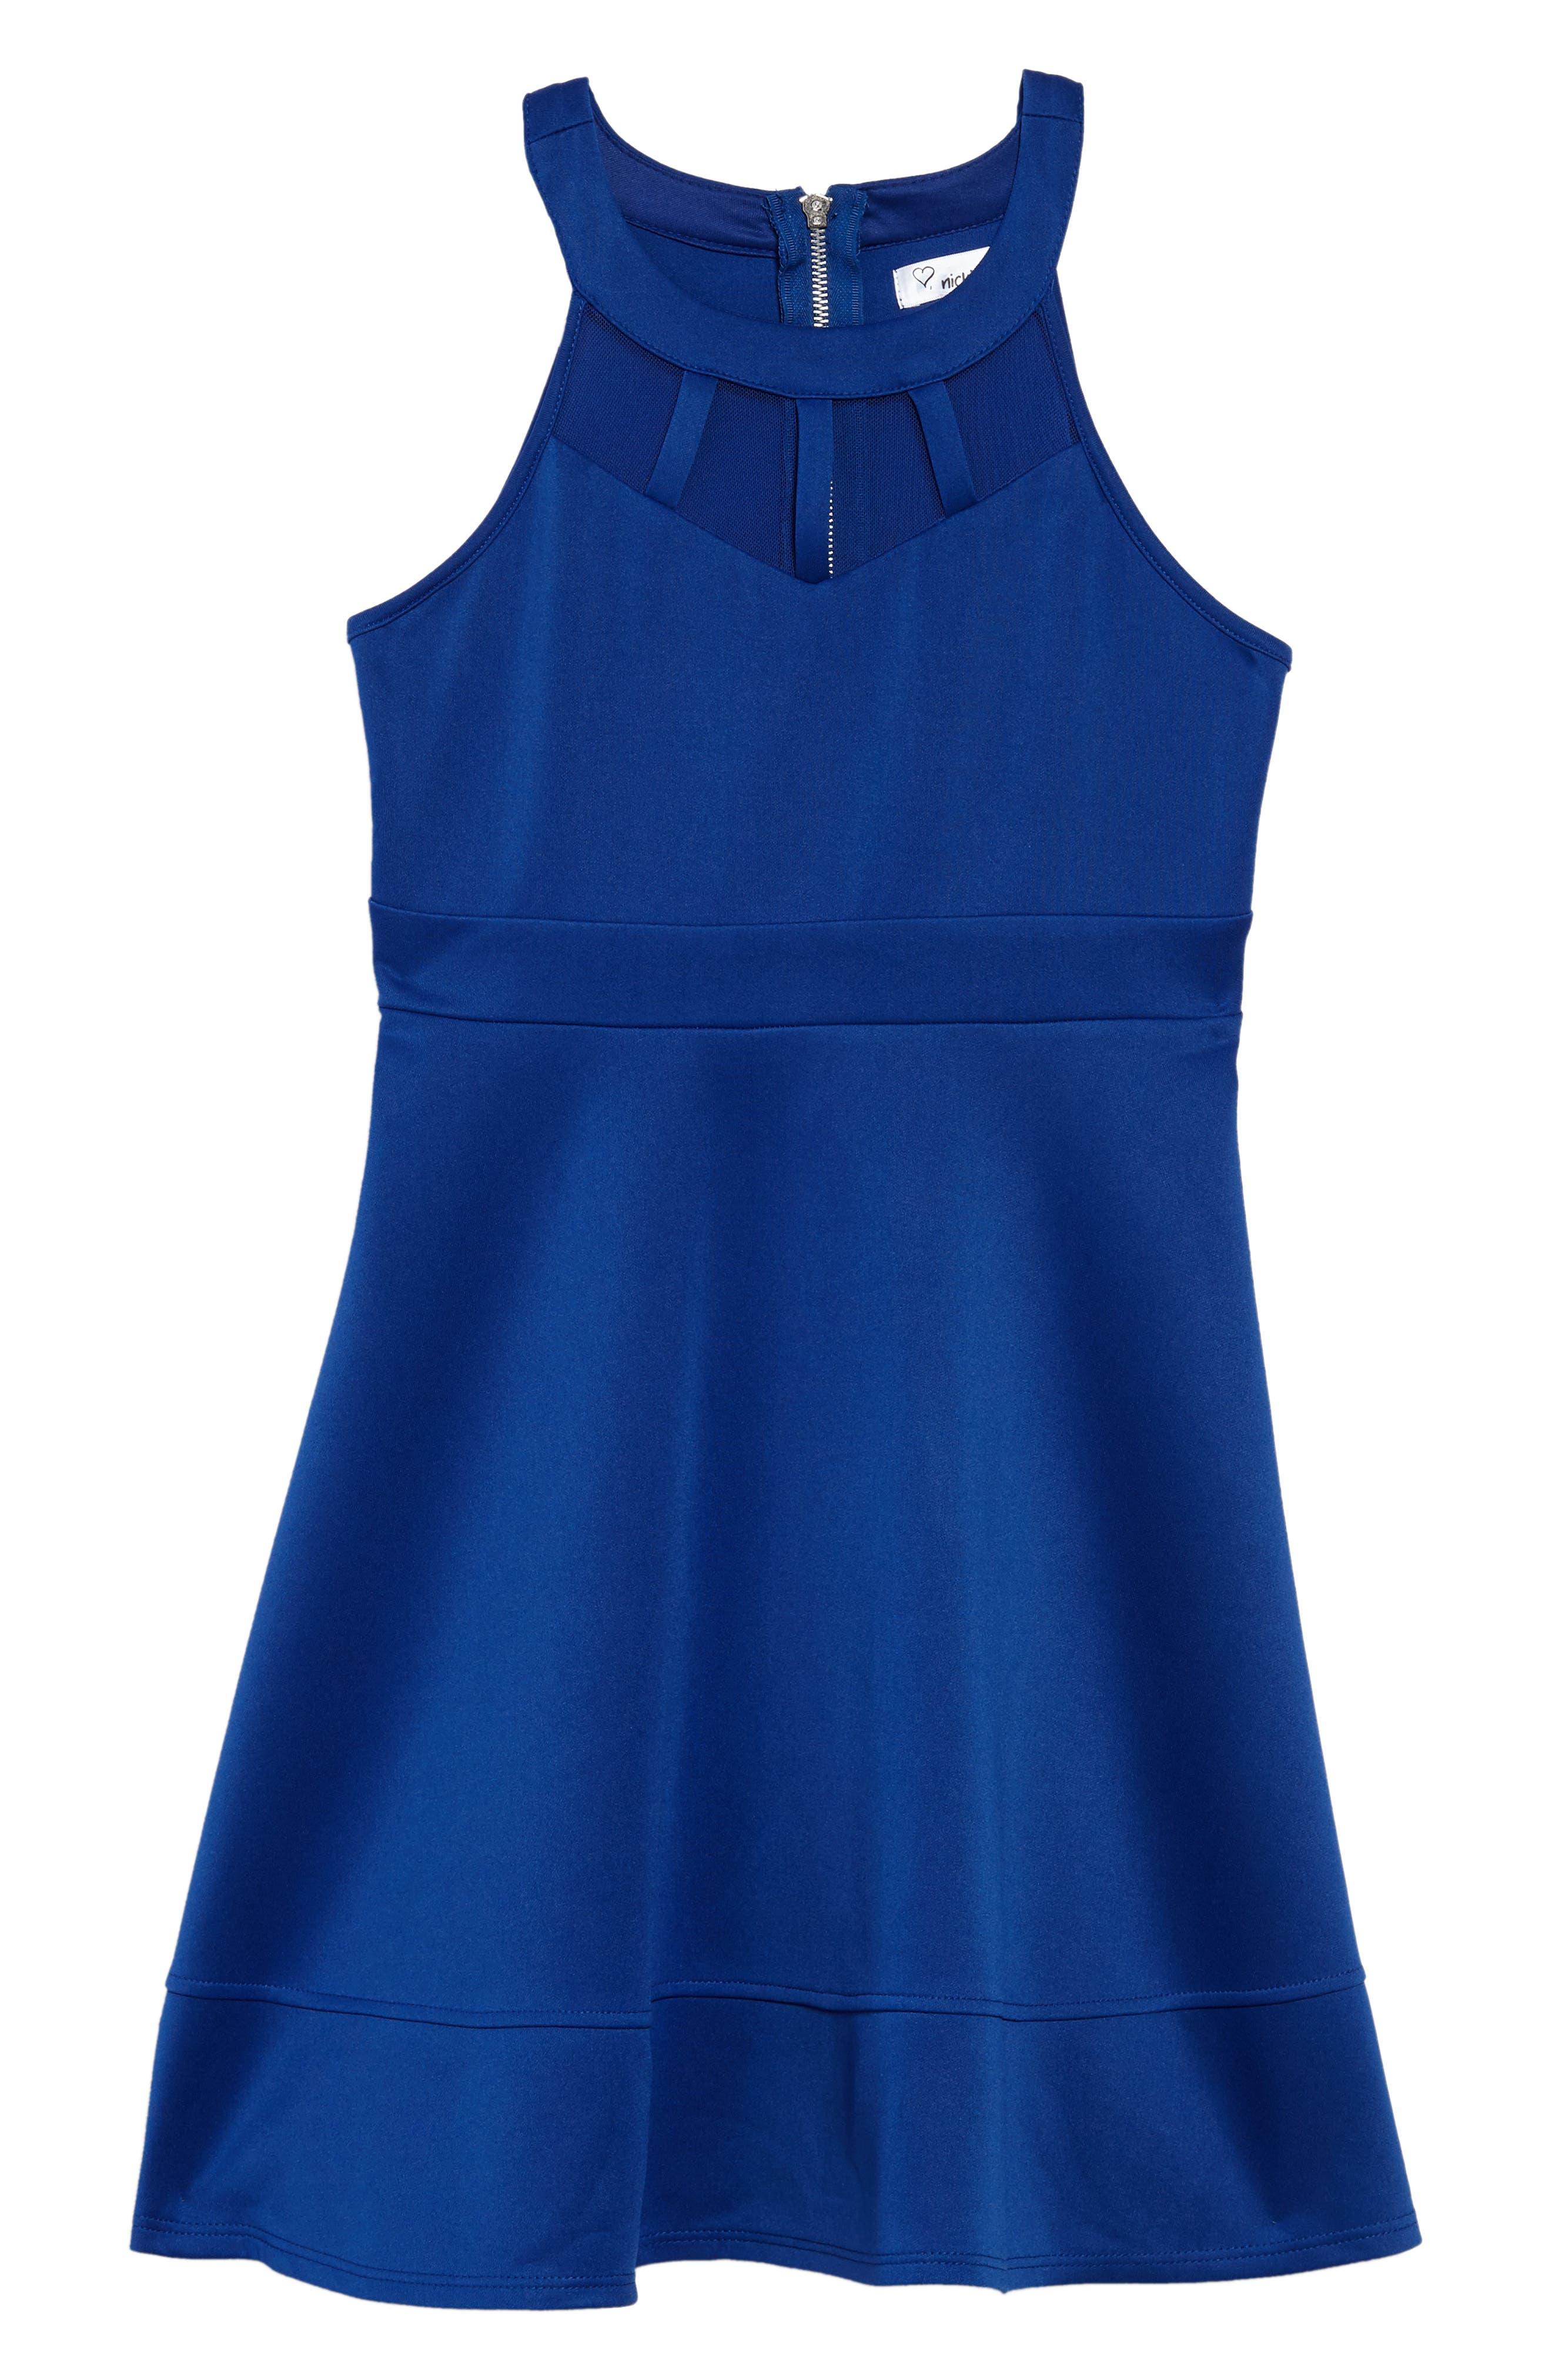 Illusion Neck Skater Dress,                         Main,                         color, 420